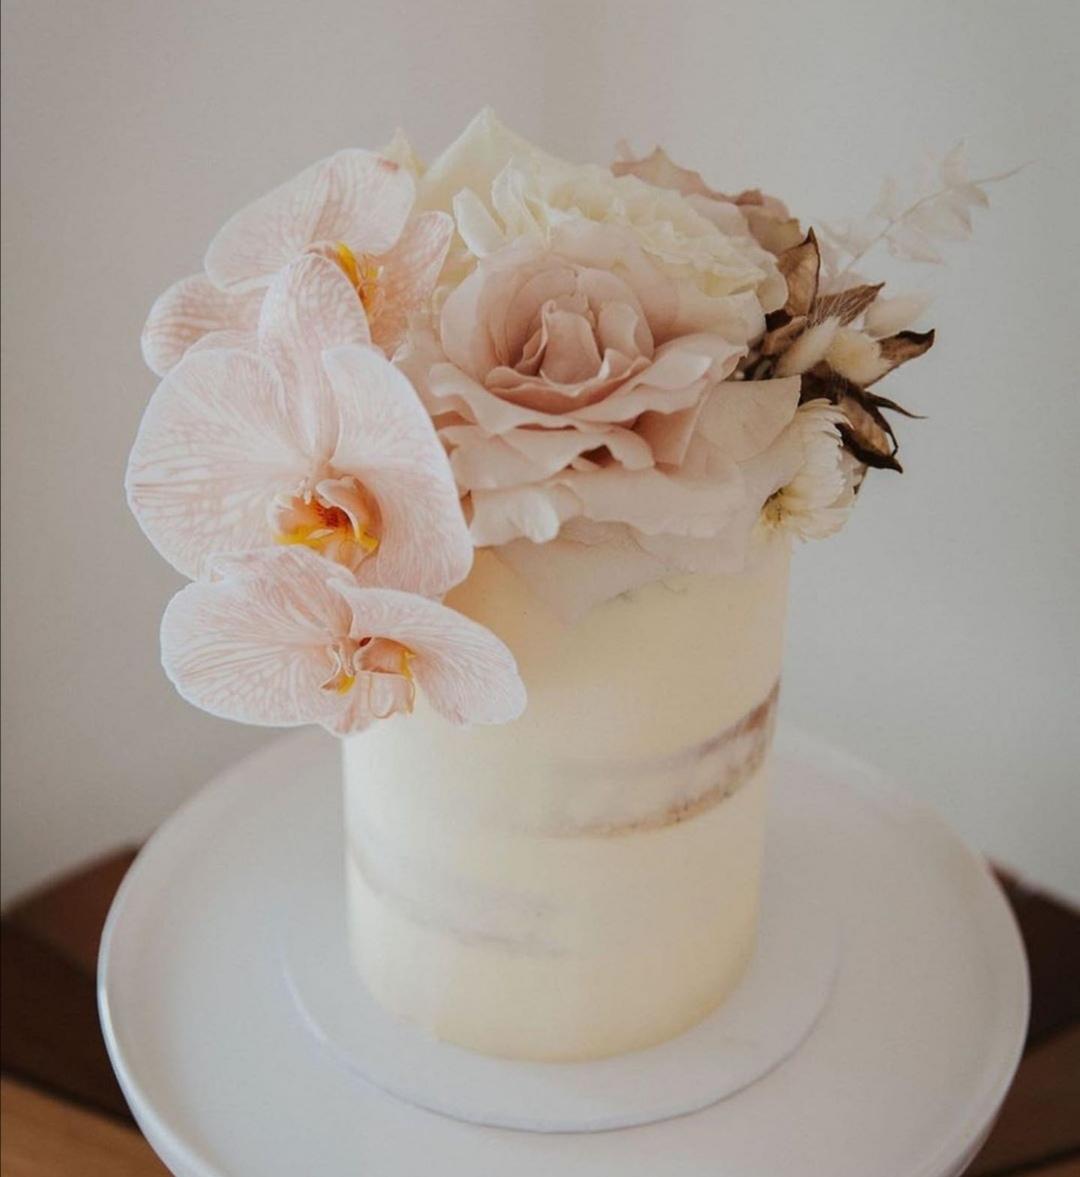 Peach Orchid single tier wedding cake